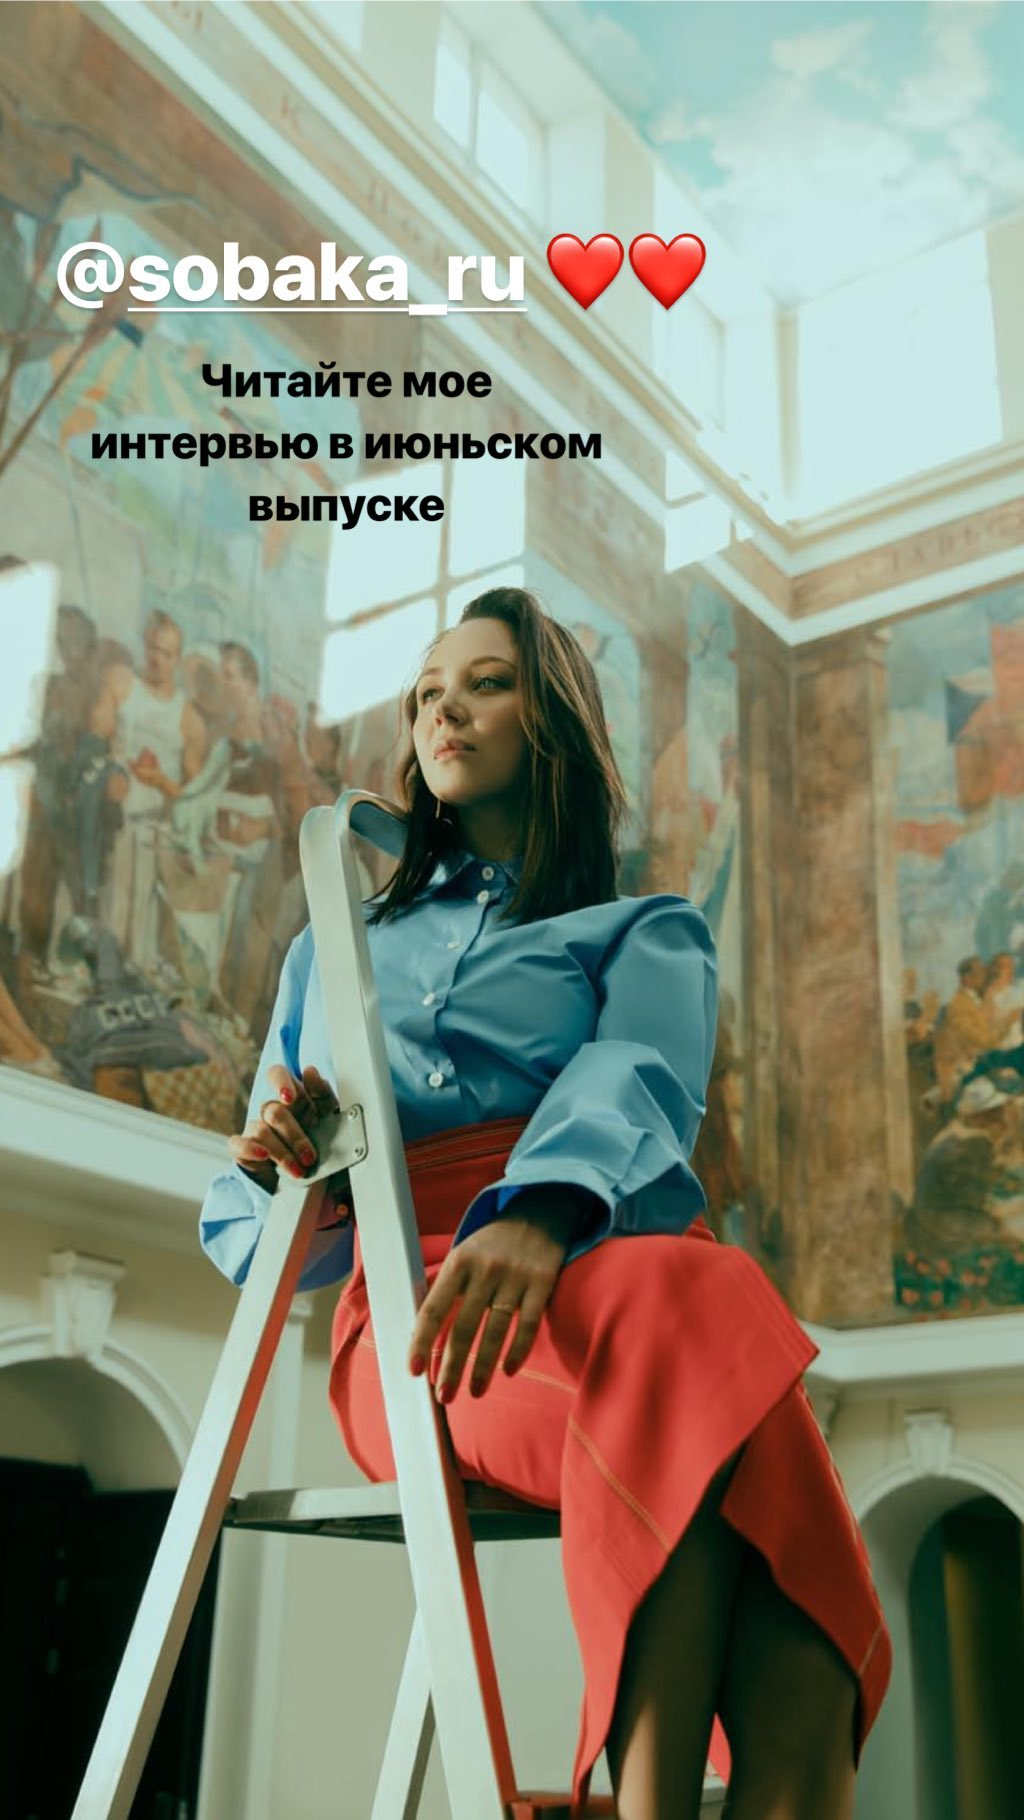 Елизавета Туктамышева & Андрей Лазукин - 5 - Страница 11 4l_C74DDo0w